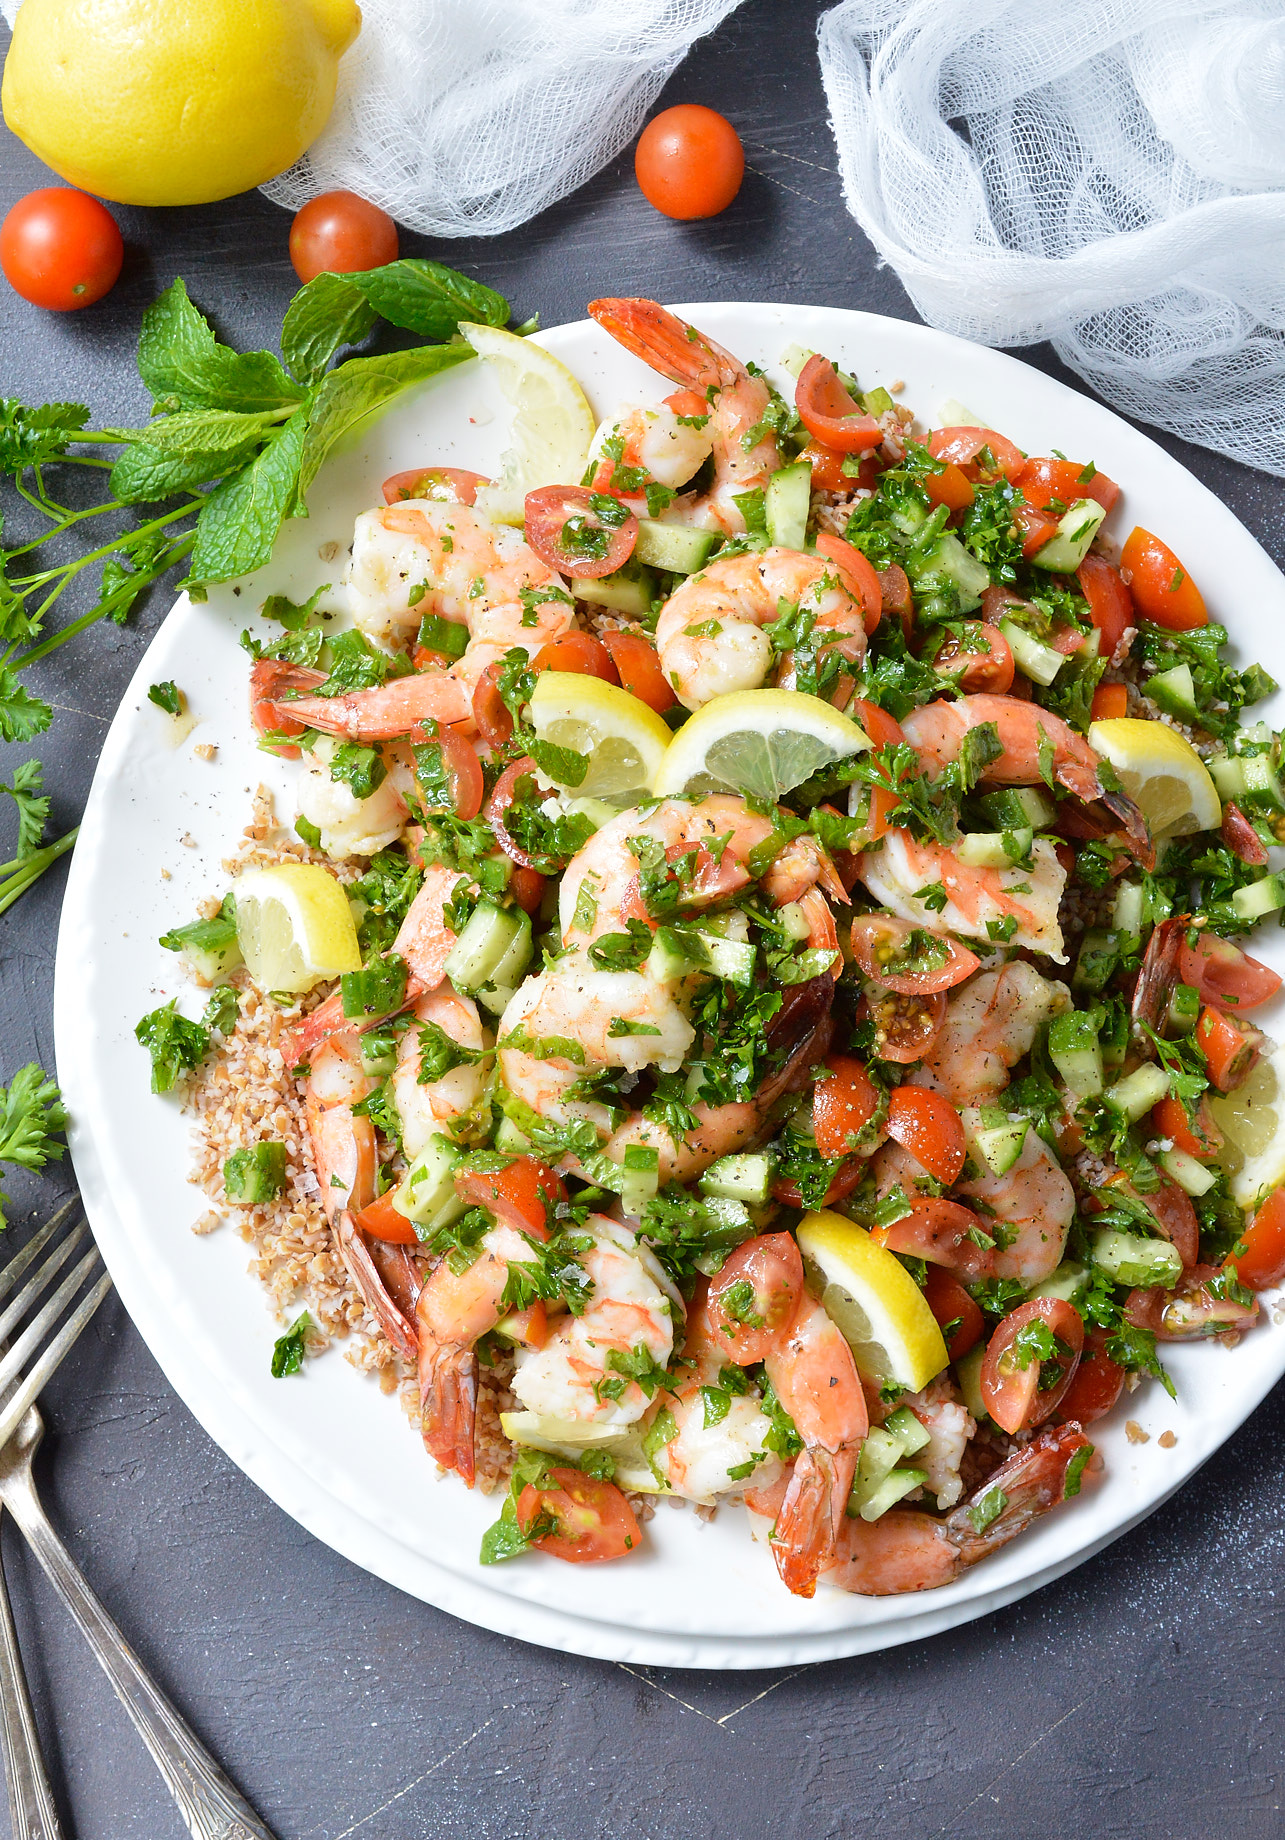 how to prepare tabouli salad